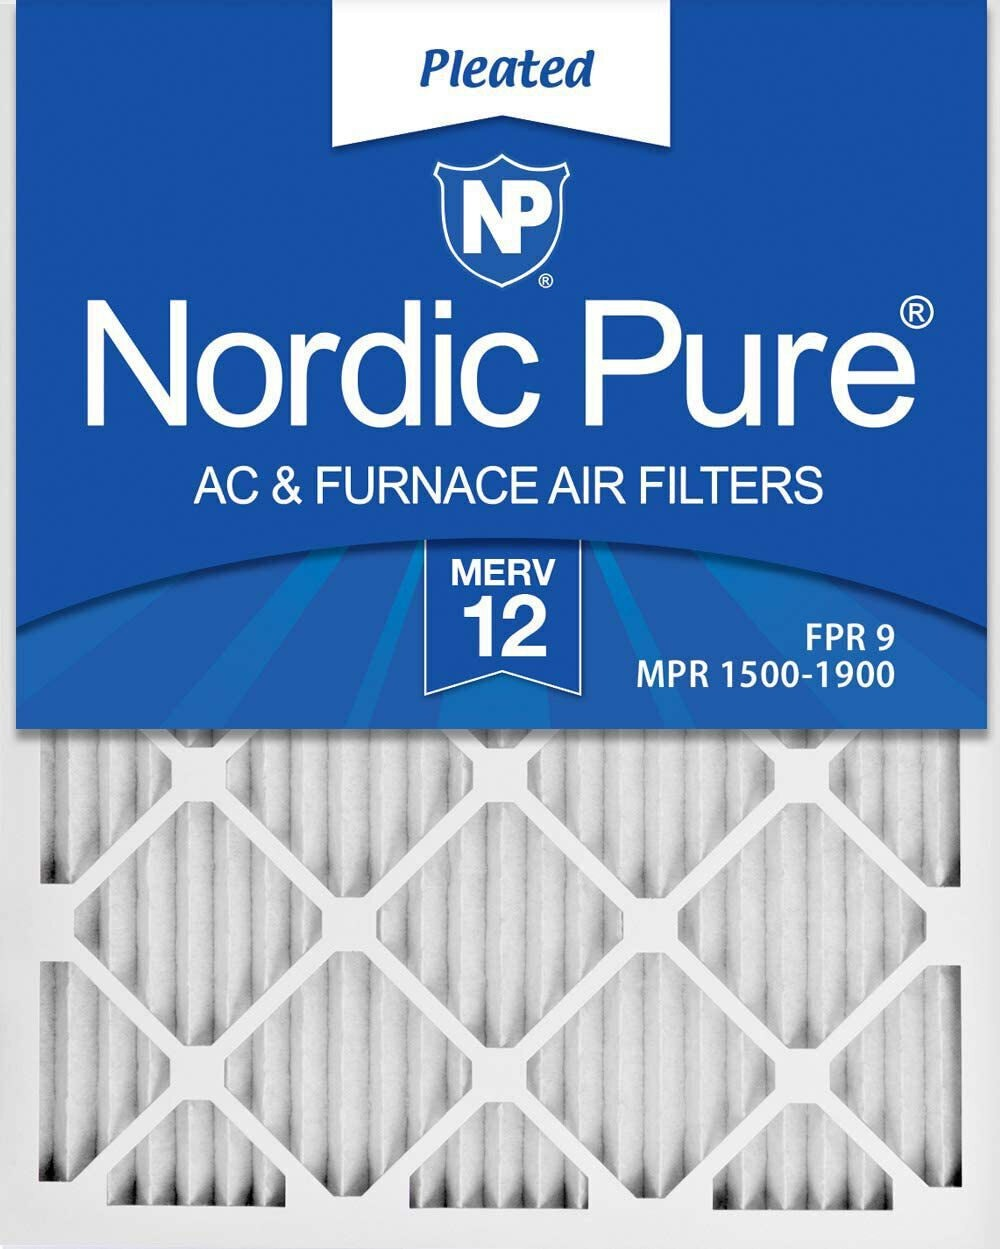 Nordic Pure MERV 12